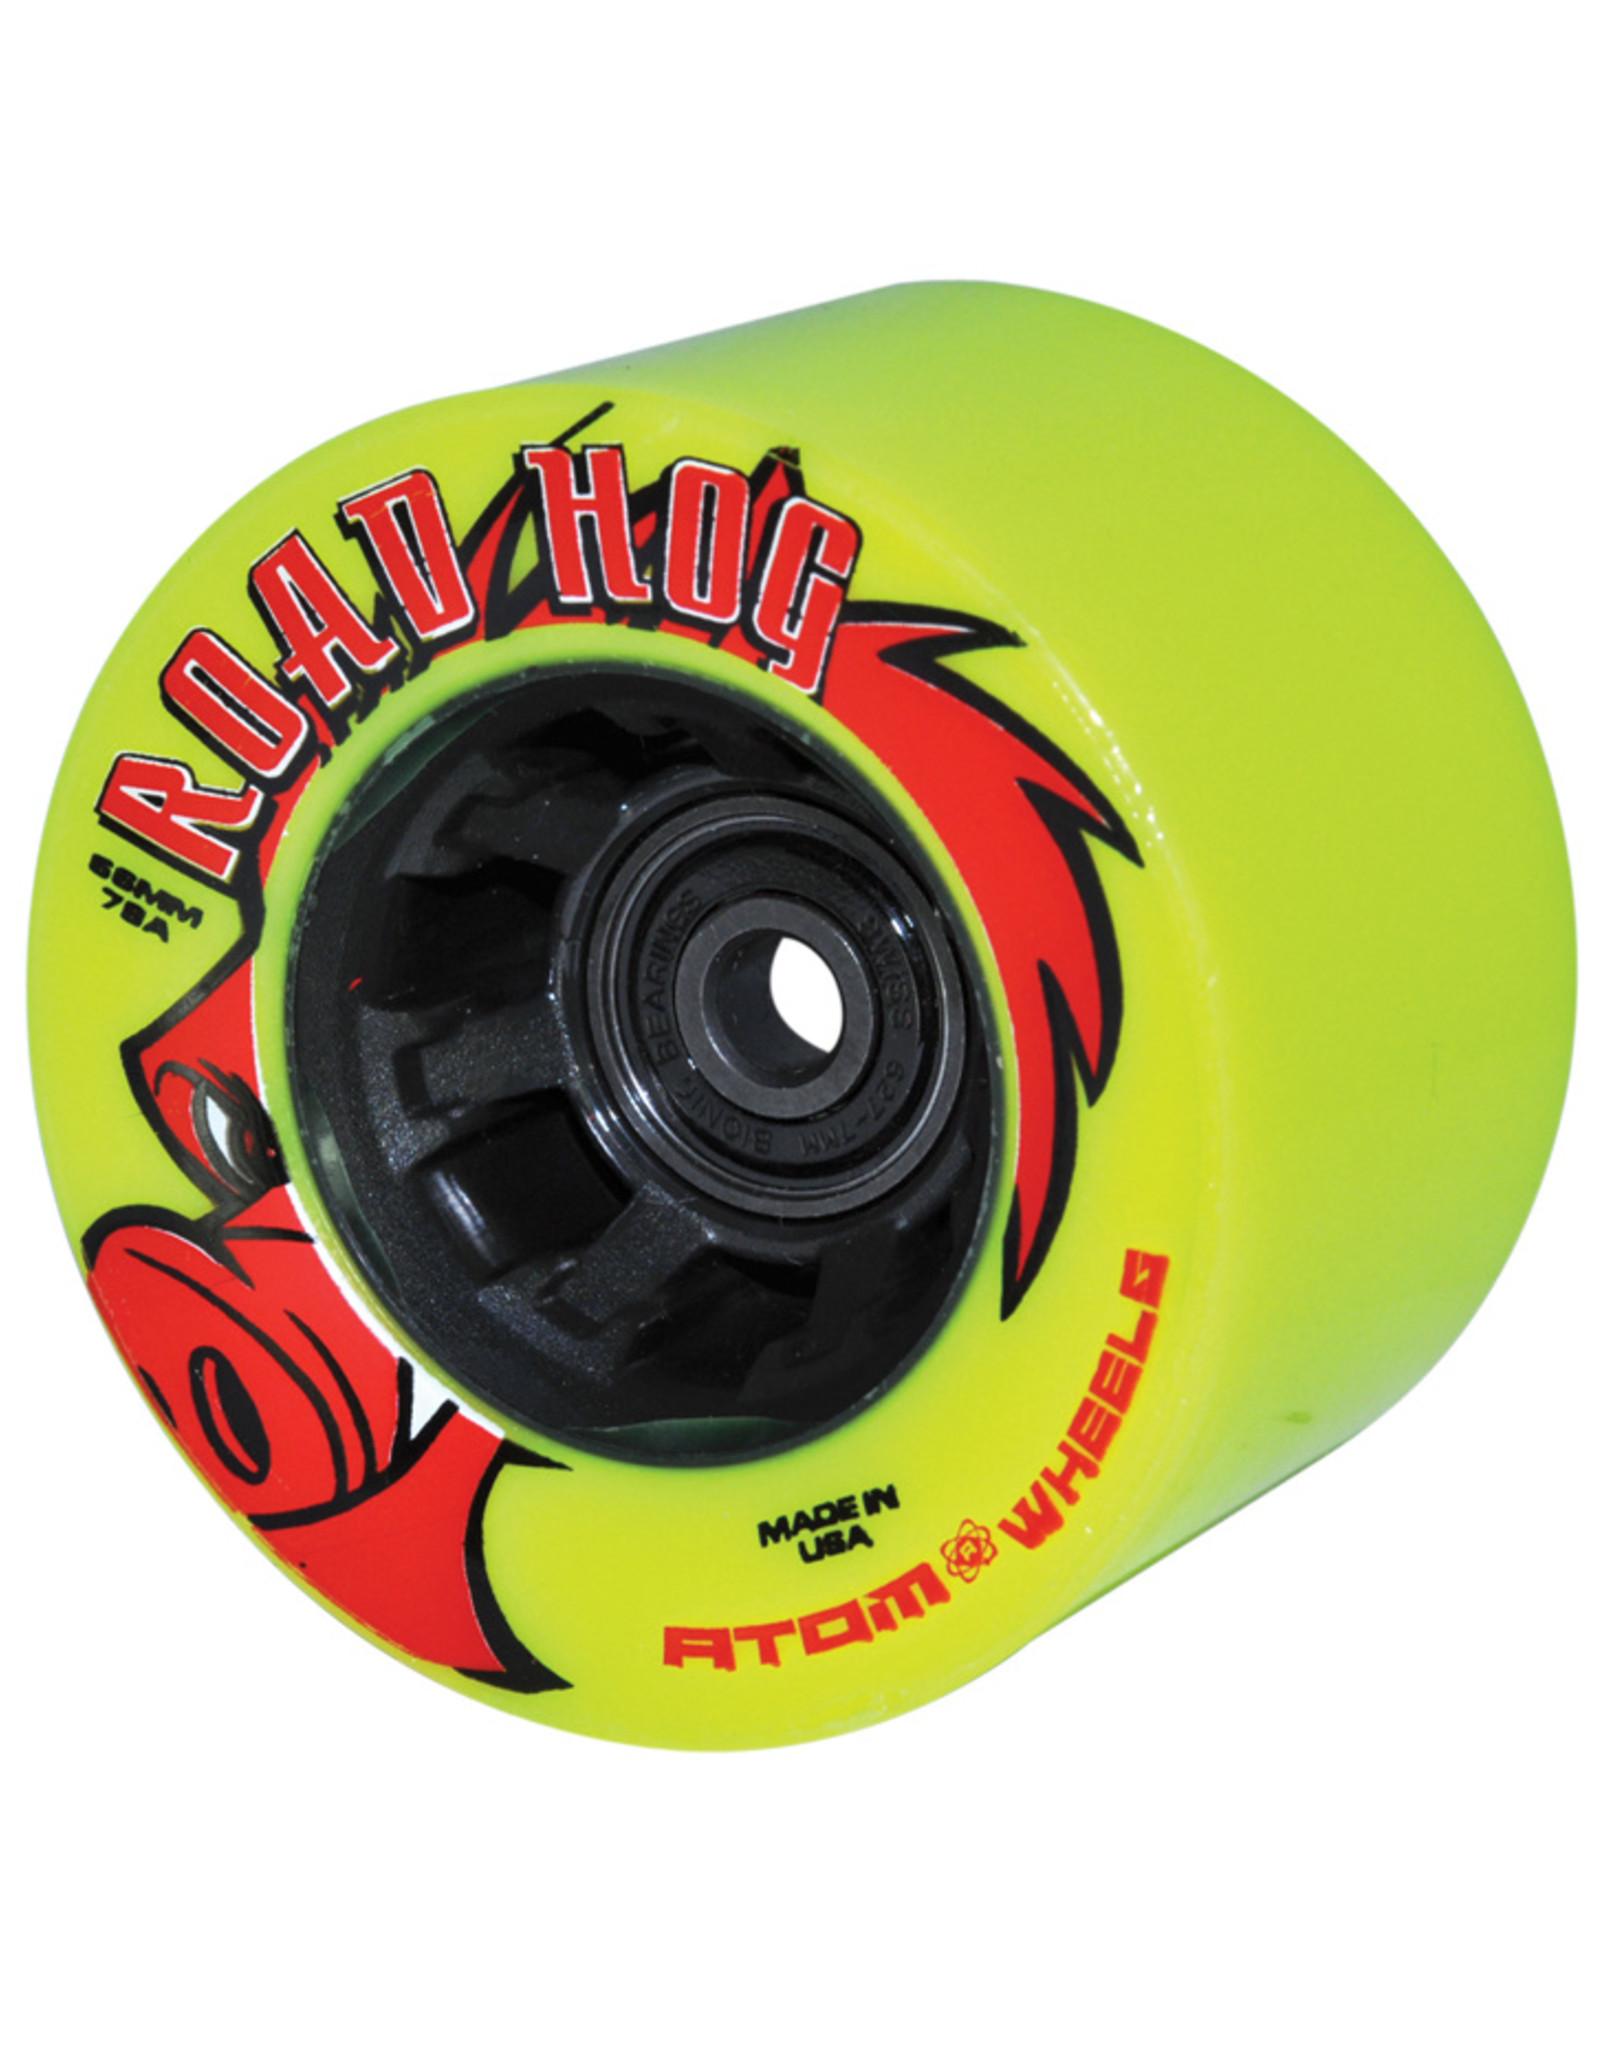 Atom Atom Roadhog Wheels, 4 Pack